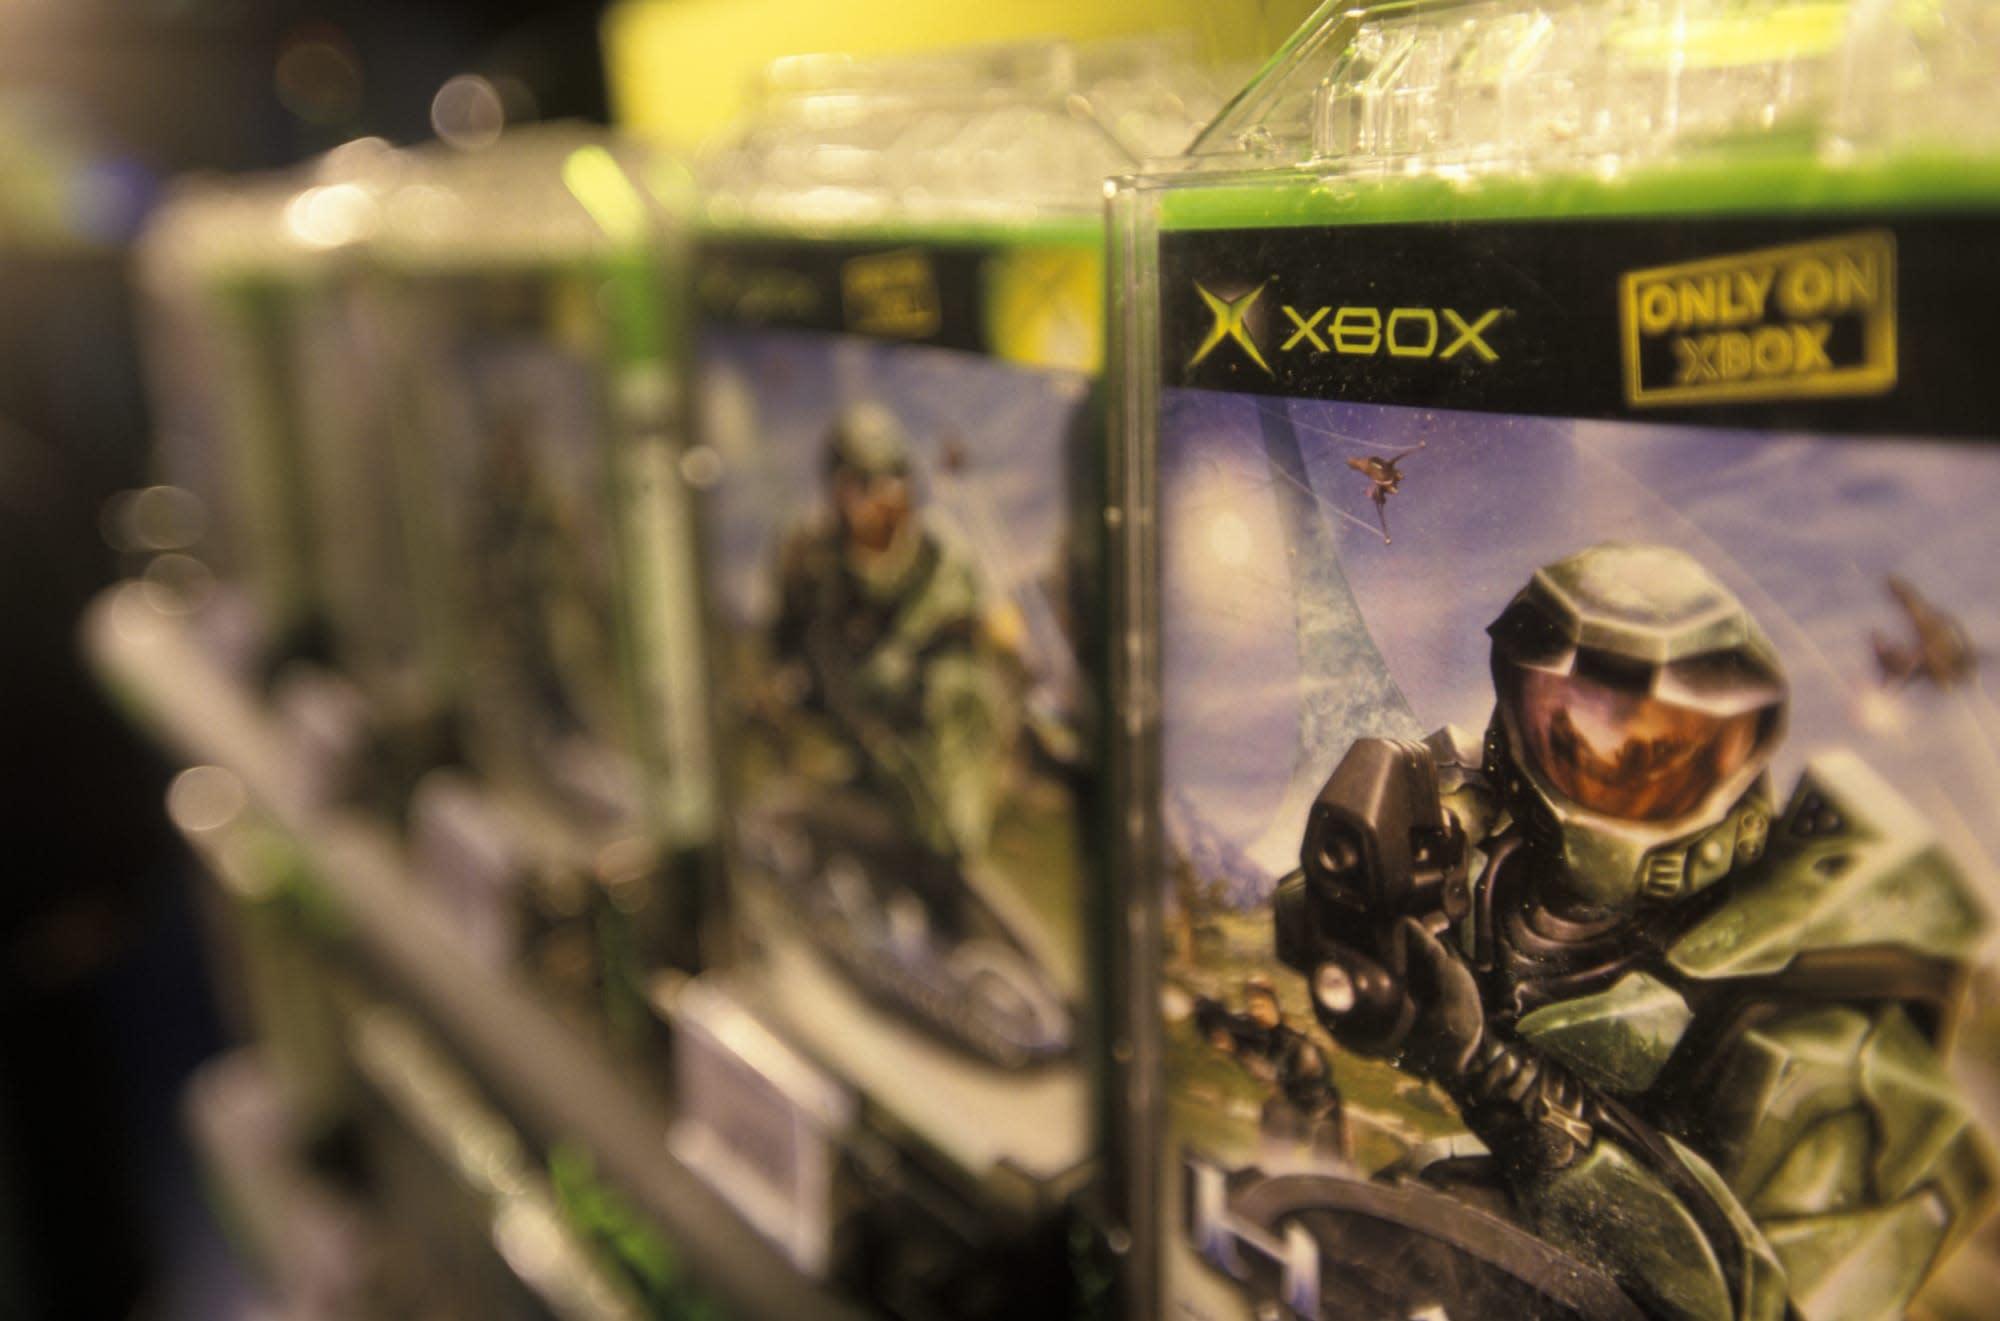 Microsoft Xbox Video Games